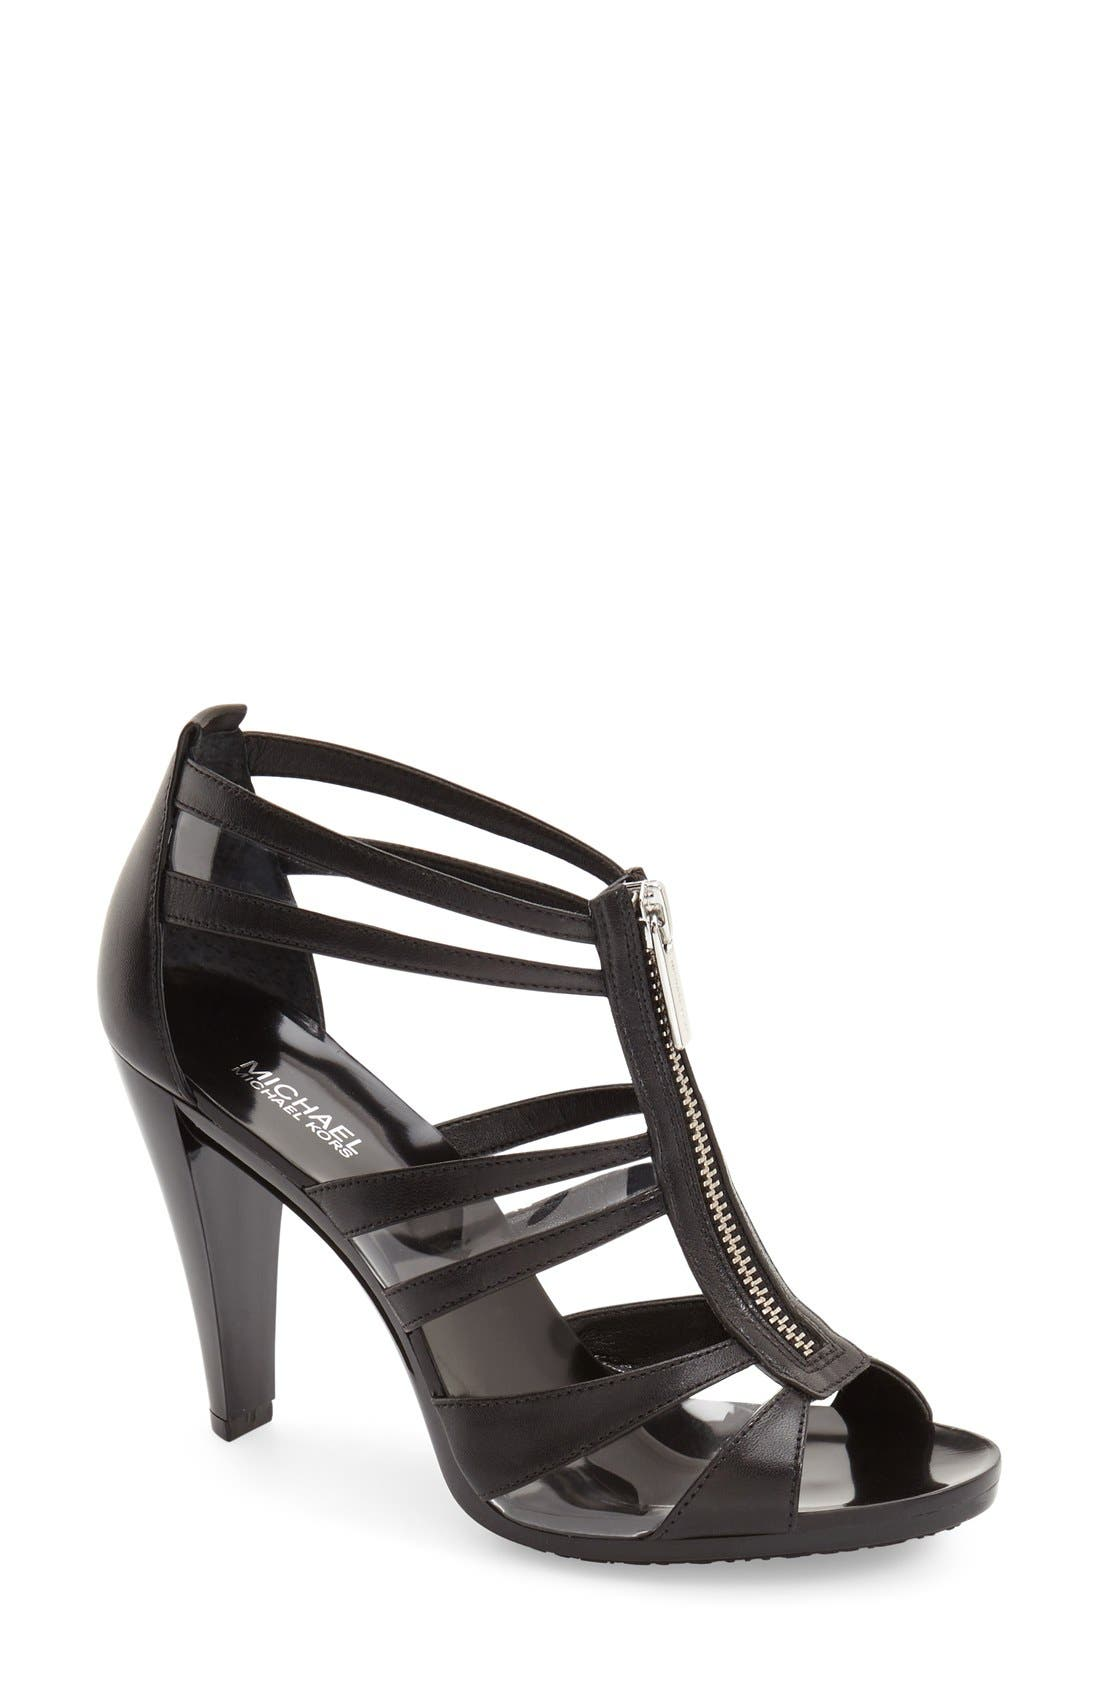 'Berkley' T-Strap Sandal, Main, color, 001